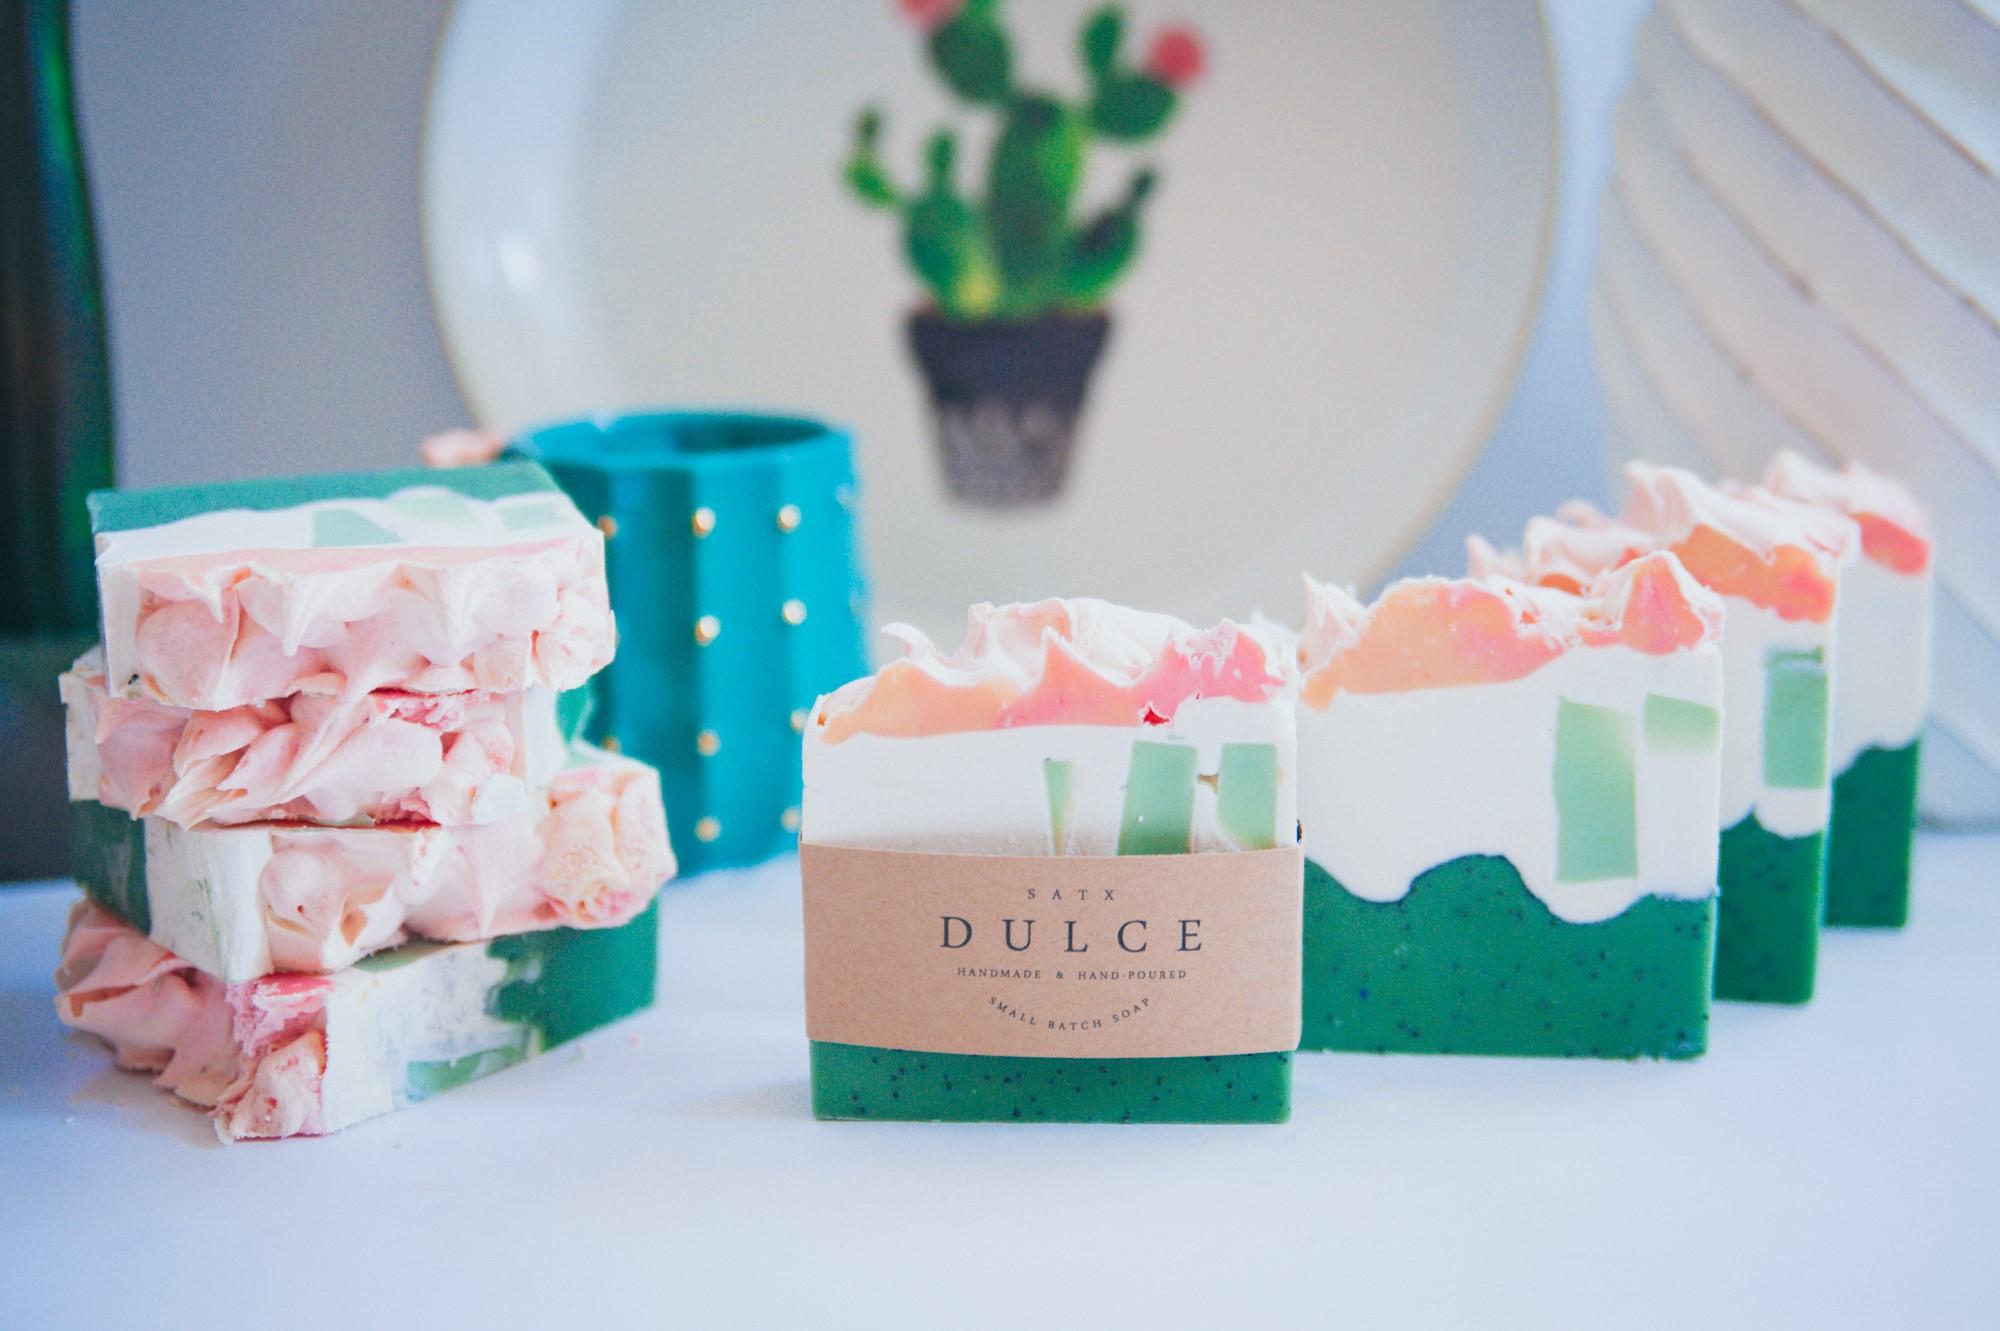 Dulce Soap